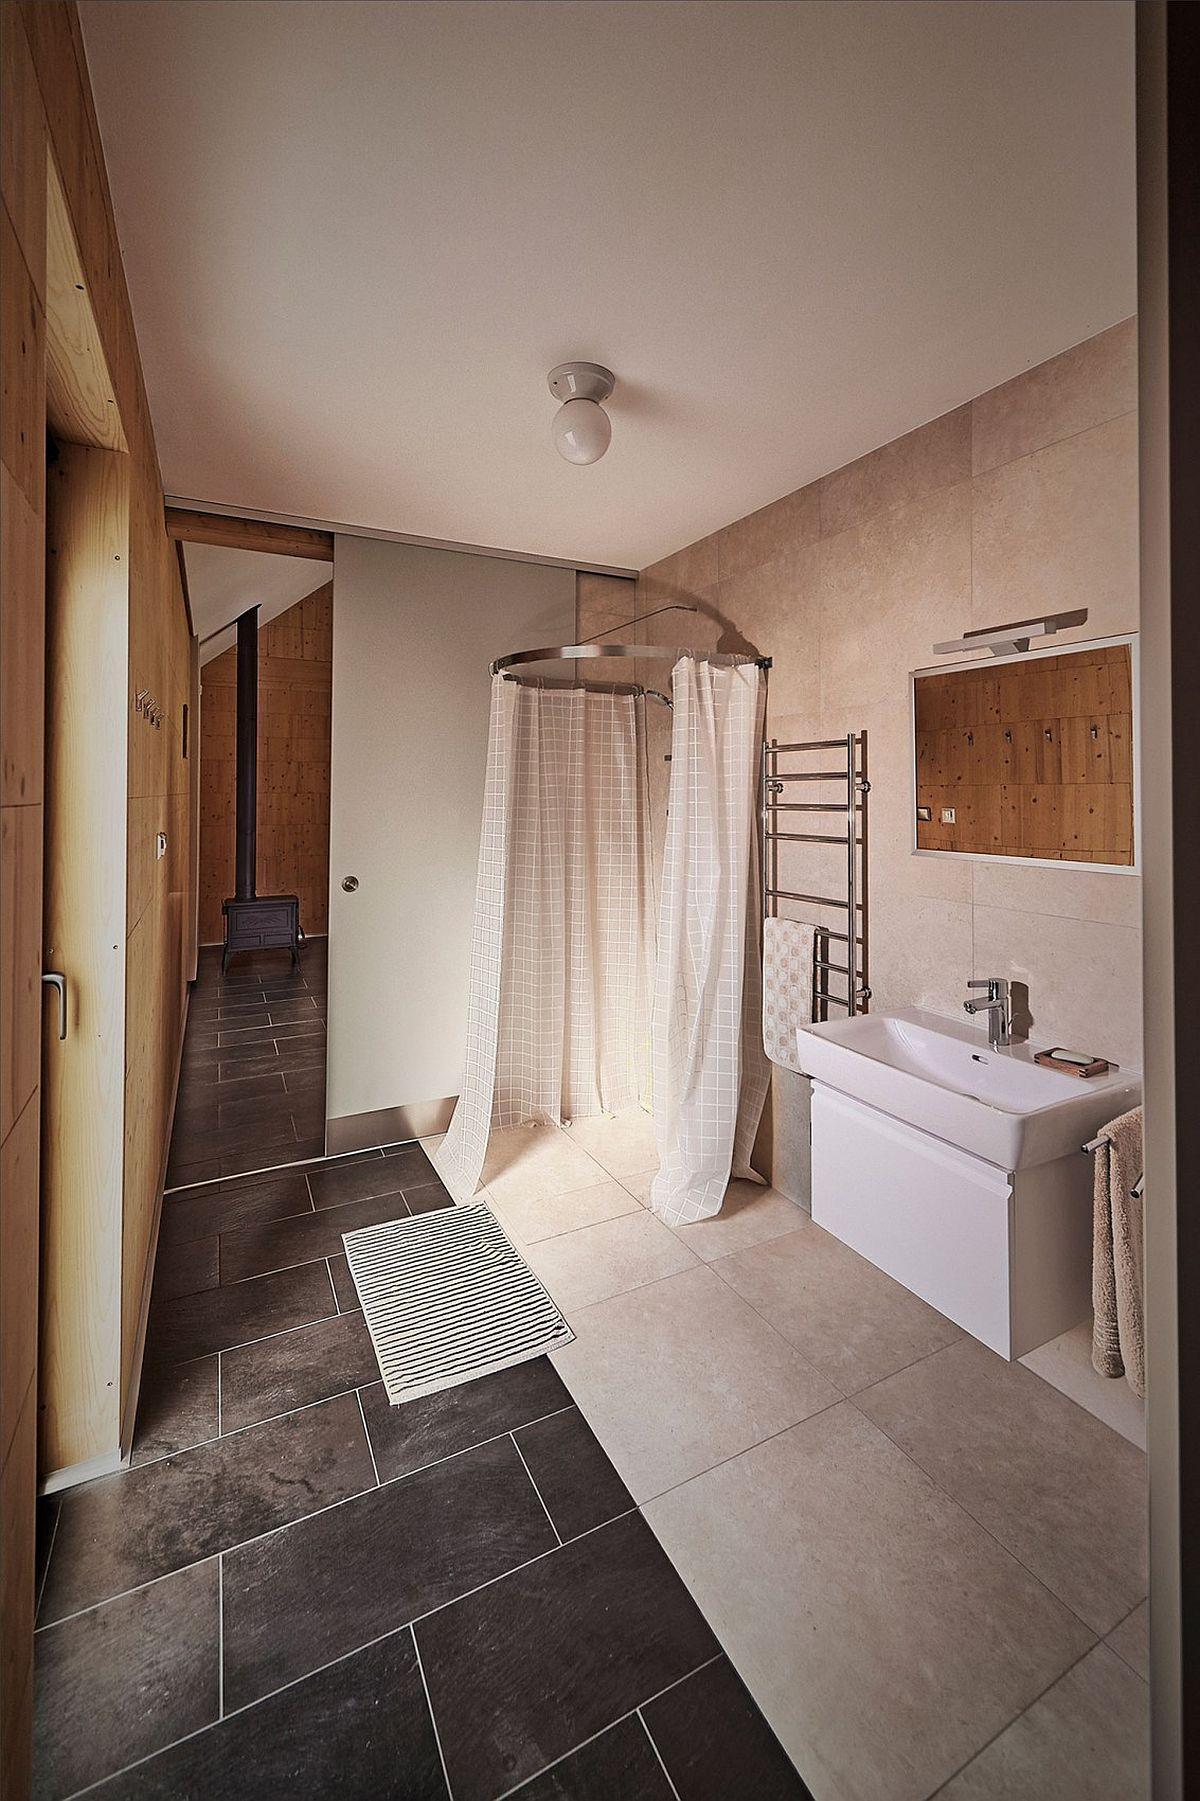 Bathroom and corner shower zone